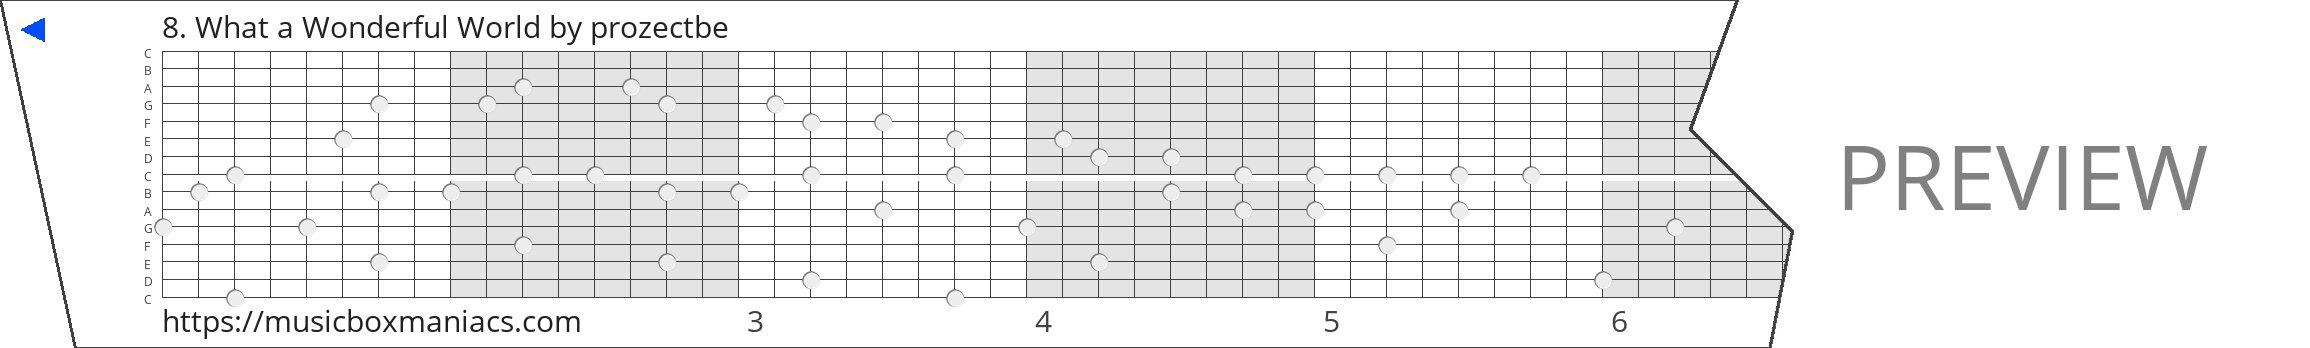 8. What a Wonderful World 15 note music box paper strip